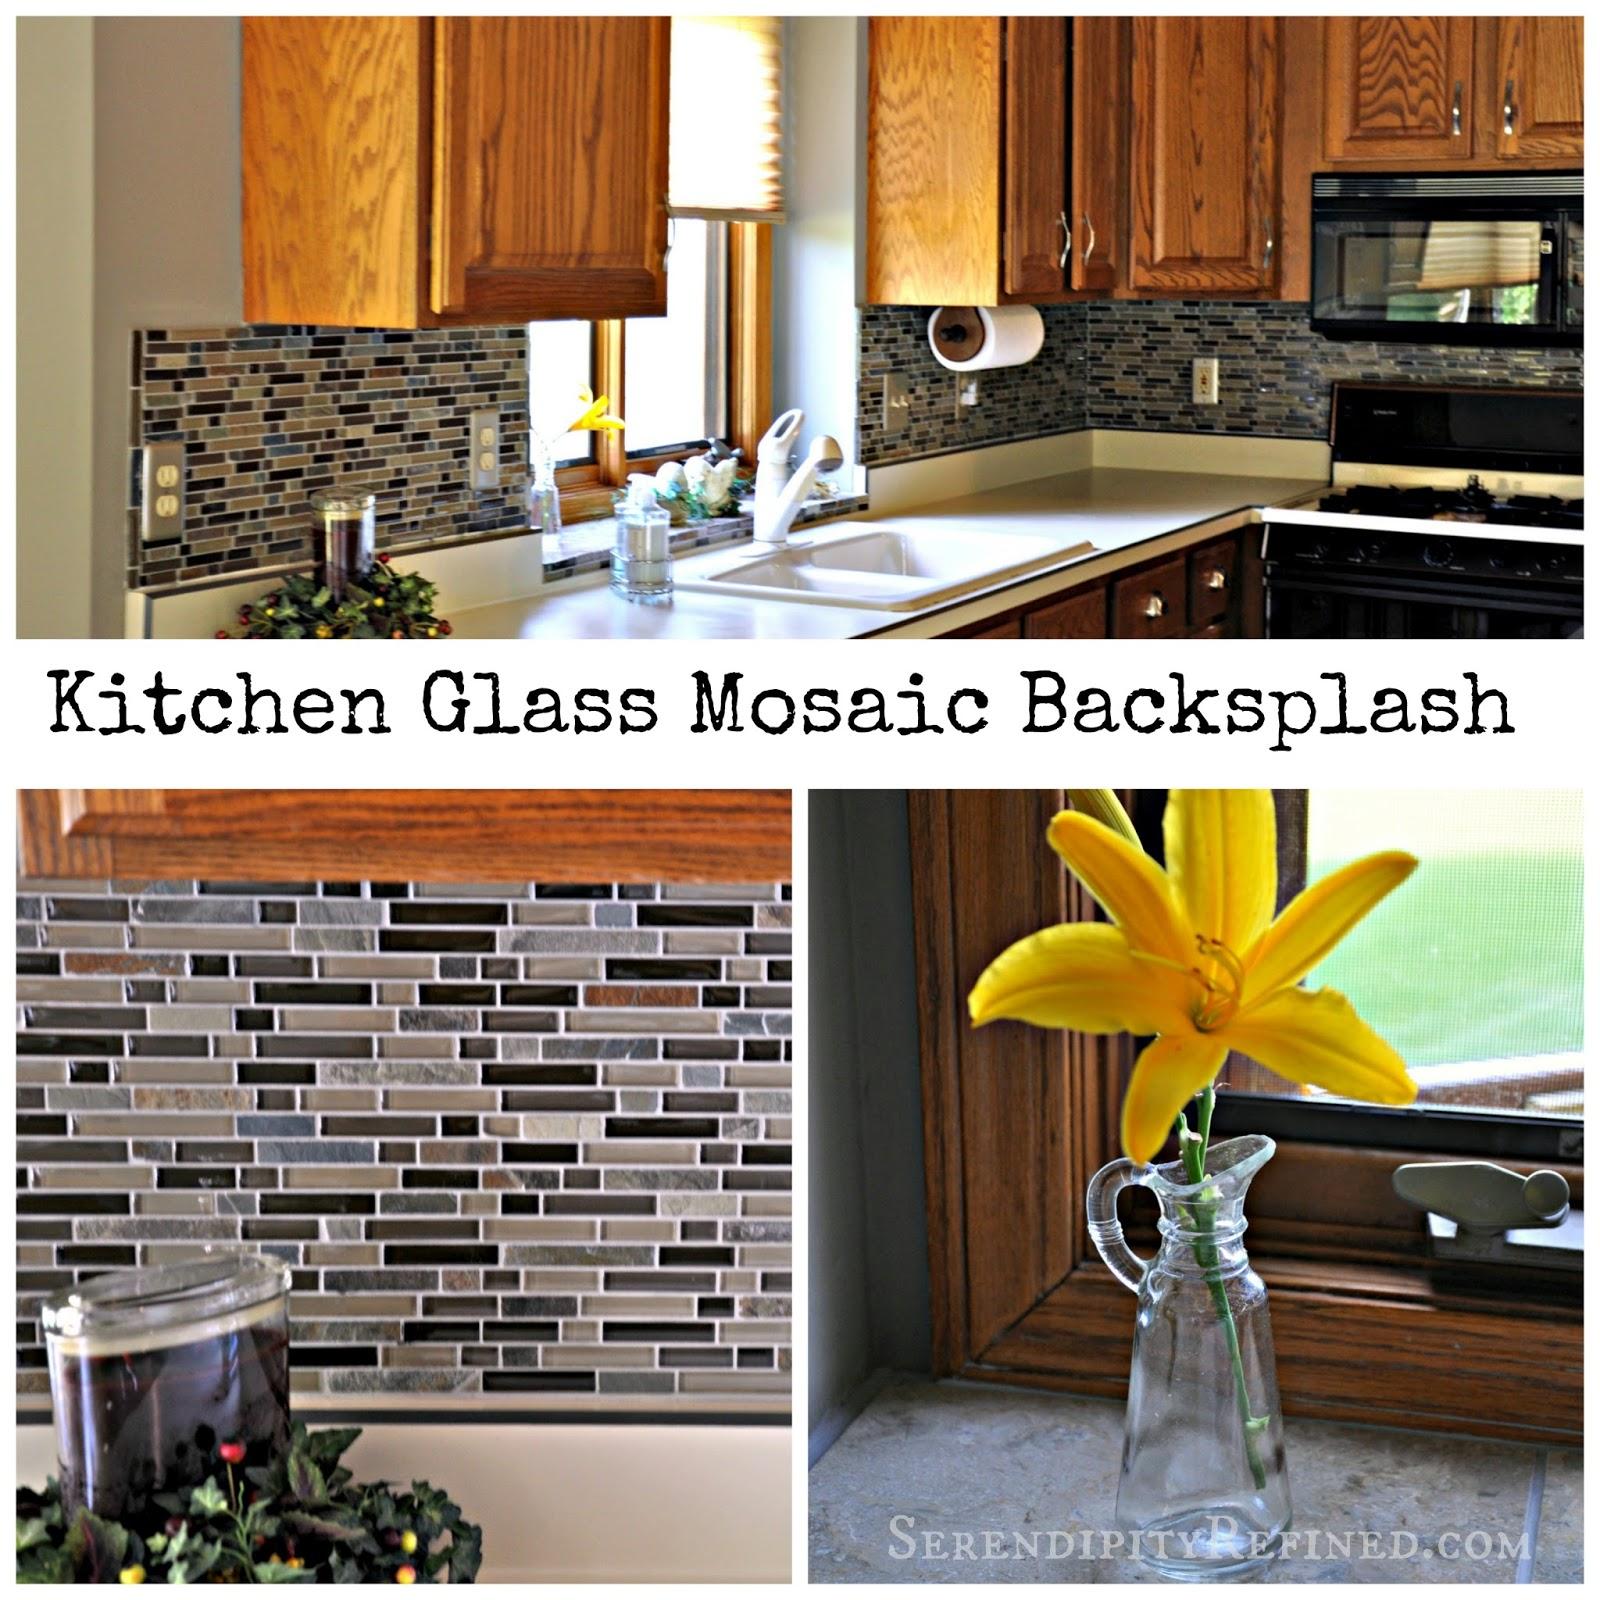 Enjoyable Serendipity Refined Blog Diy Updates Glass Mosaic Tile Download Free Architecture Designs Embacsunscenecom